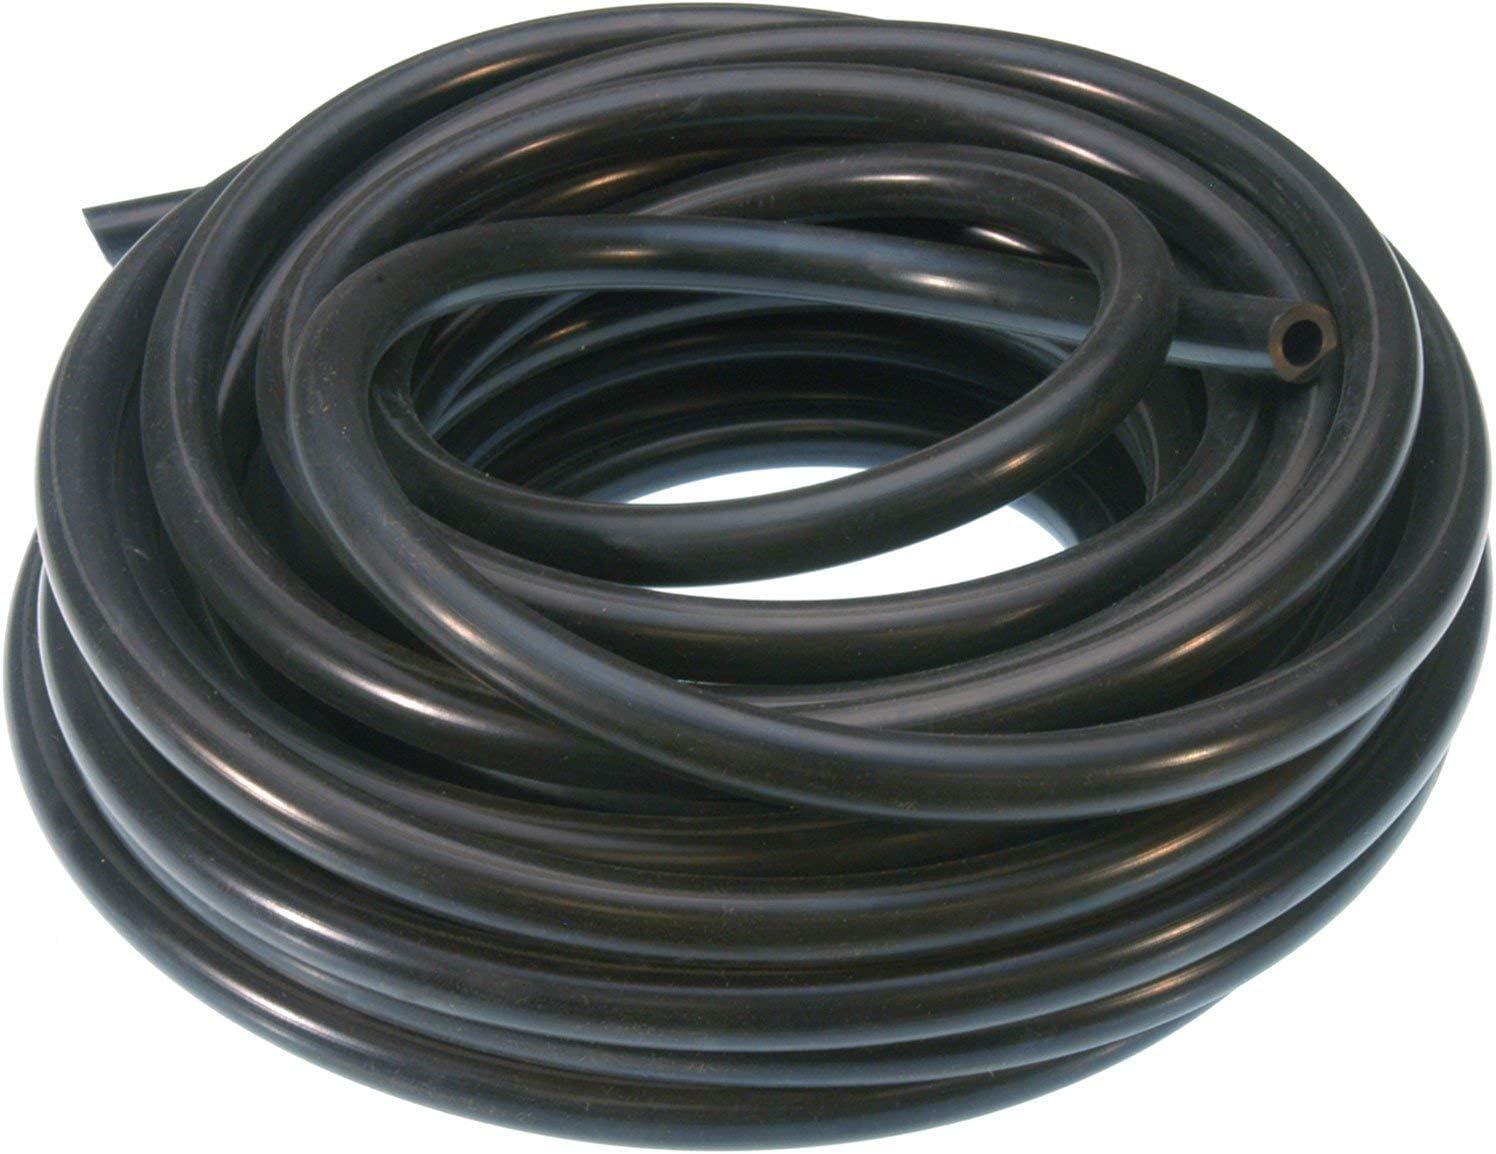 Gates 27037 Windshield Washer /& Vacuum Hose Non-Reinforced